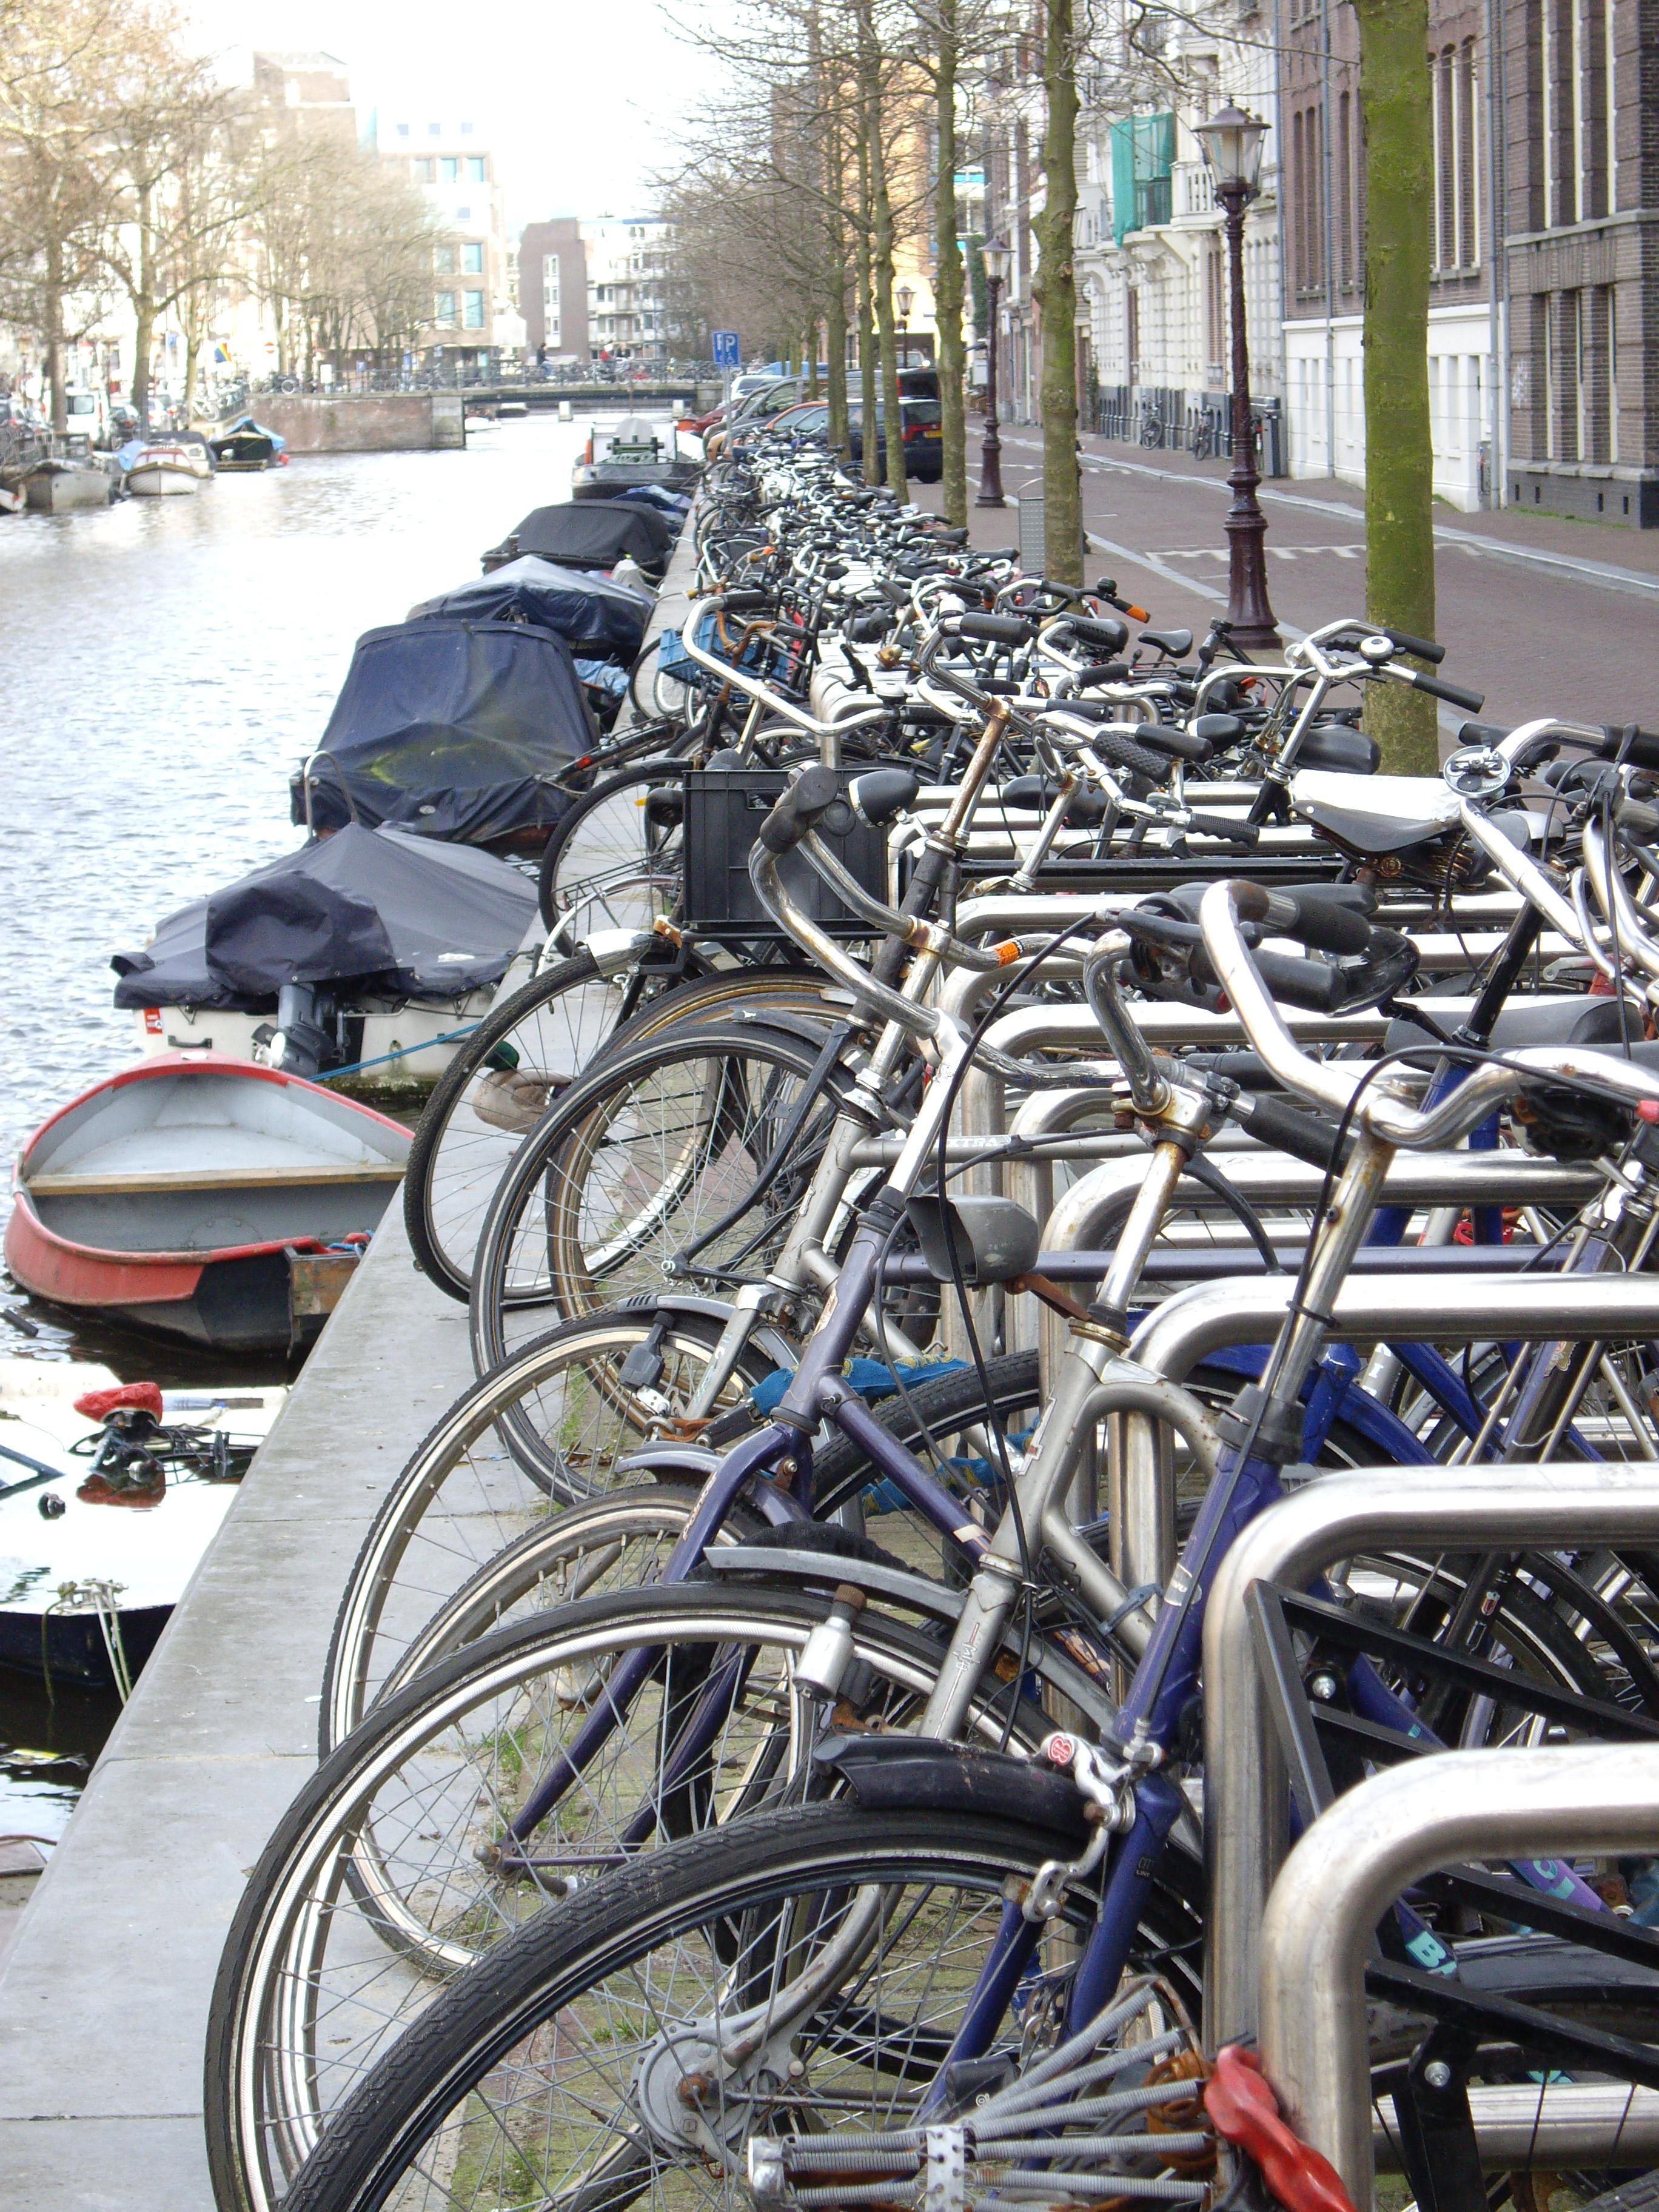 AMSTERDAM - Voyage Week End Escapage Visiter Amsterdam - 4519843079_c67fa9deb8_o